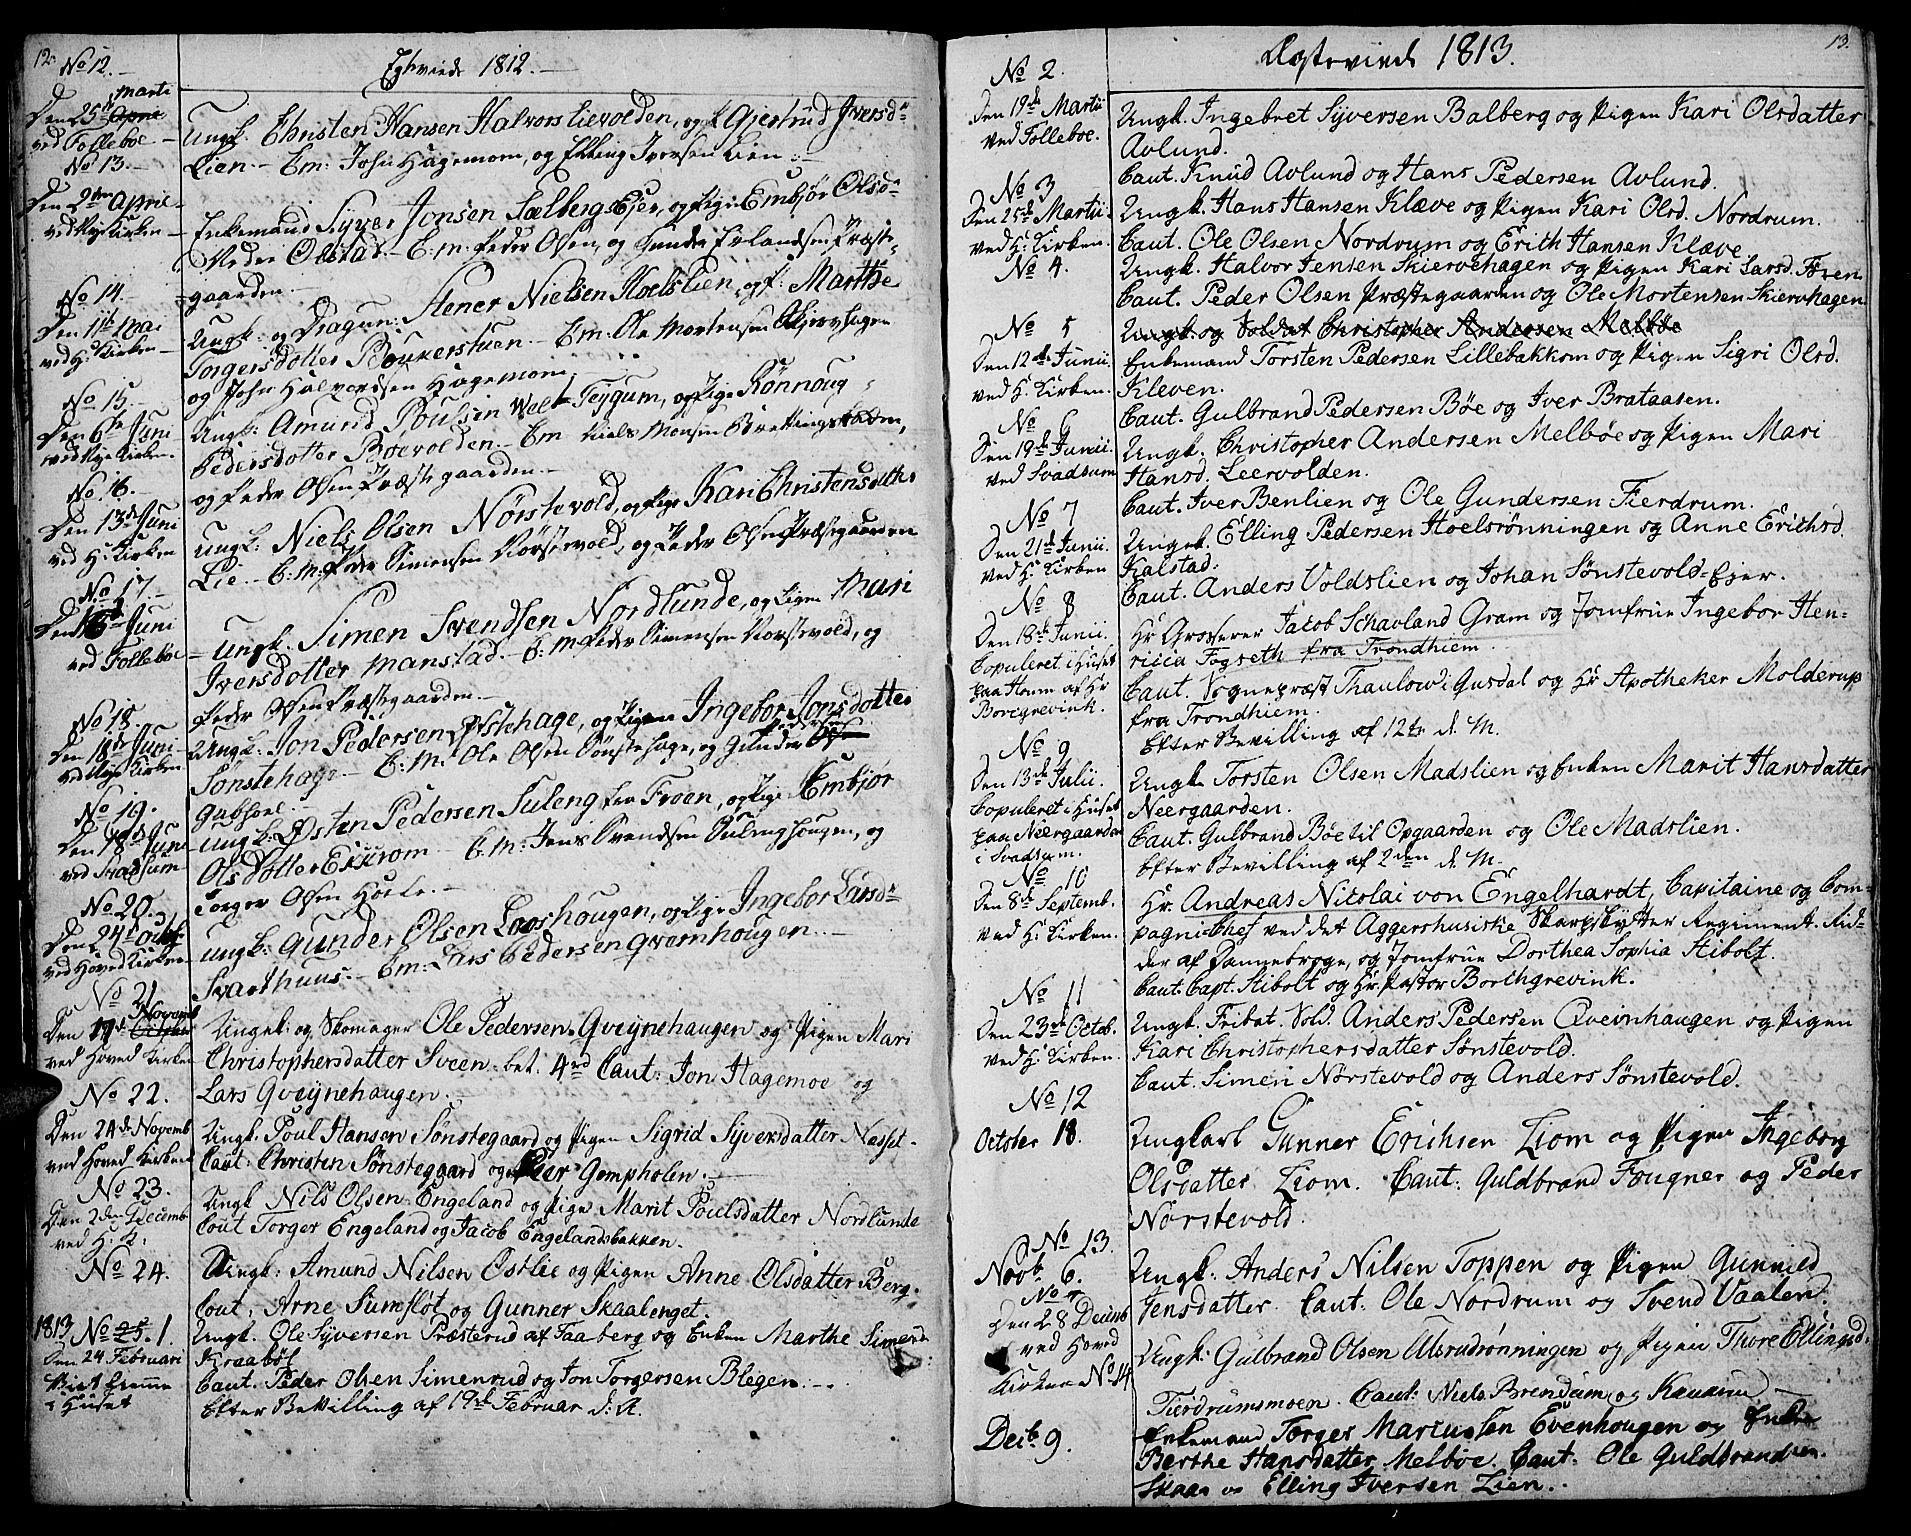 SAH, Gausdal prestekontor, Ministerialbok nr. 4, 1809-1817, s. 12-13